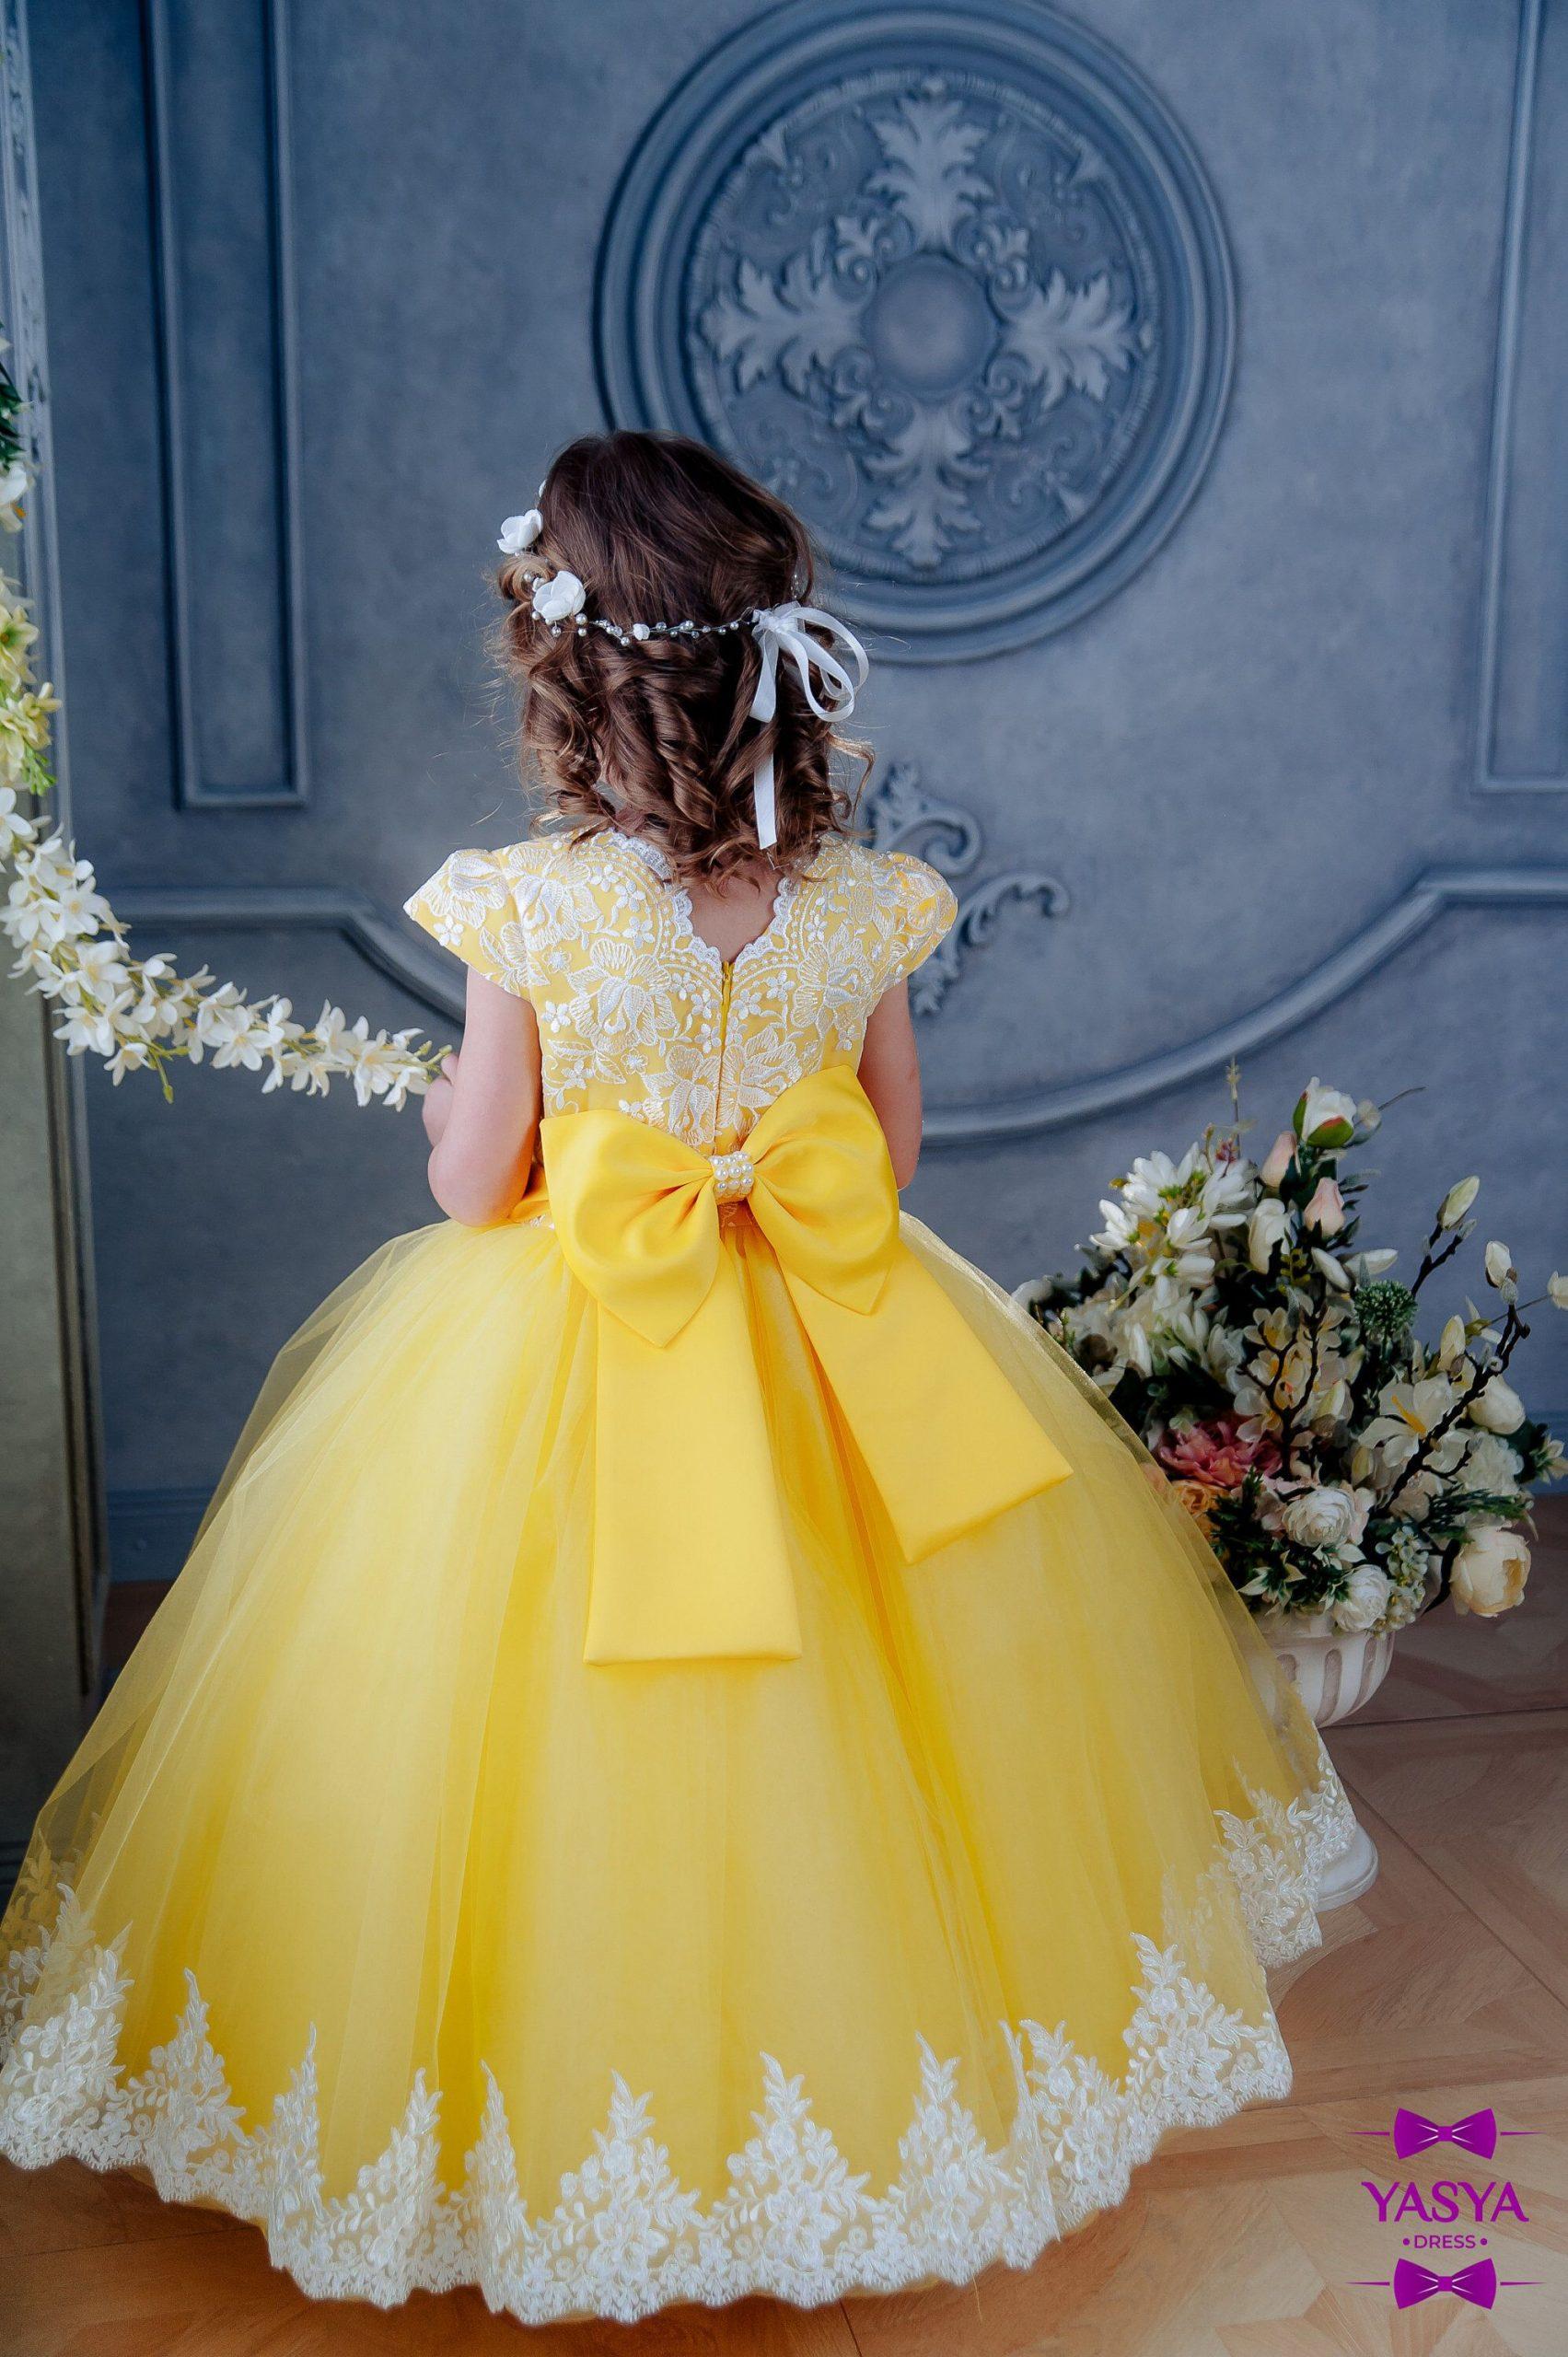 Park Art|My WordPress Blog_Yellow Flower Girl Dress Toddler